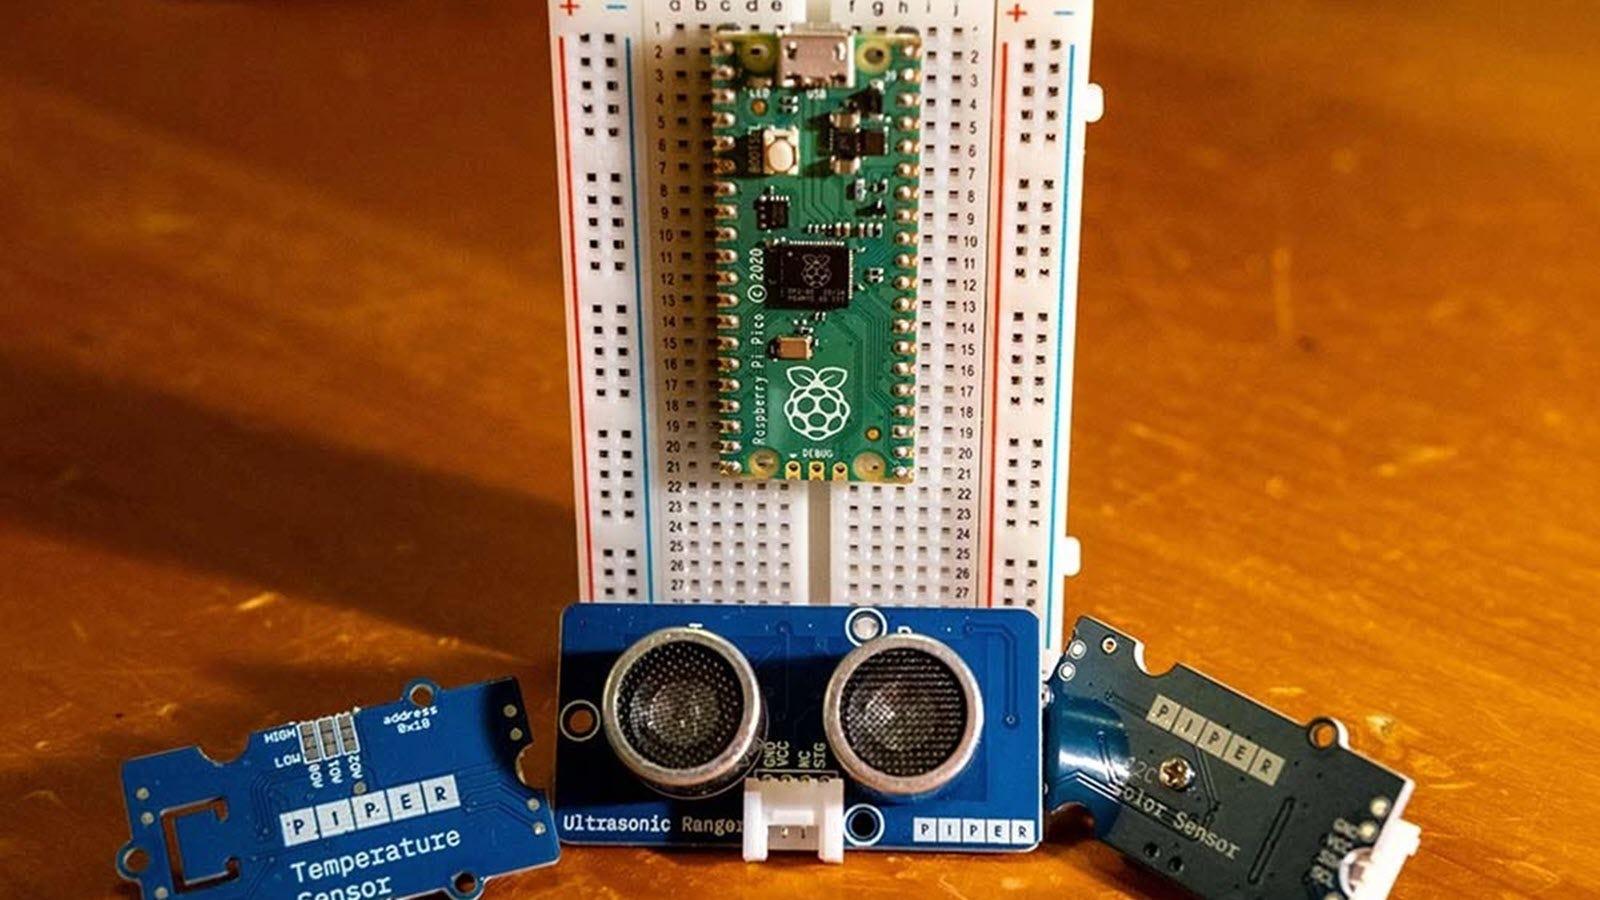 A Piper sensor kit next to a Raspberry Pi Pico